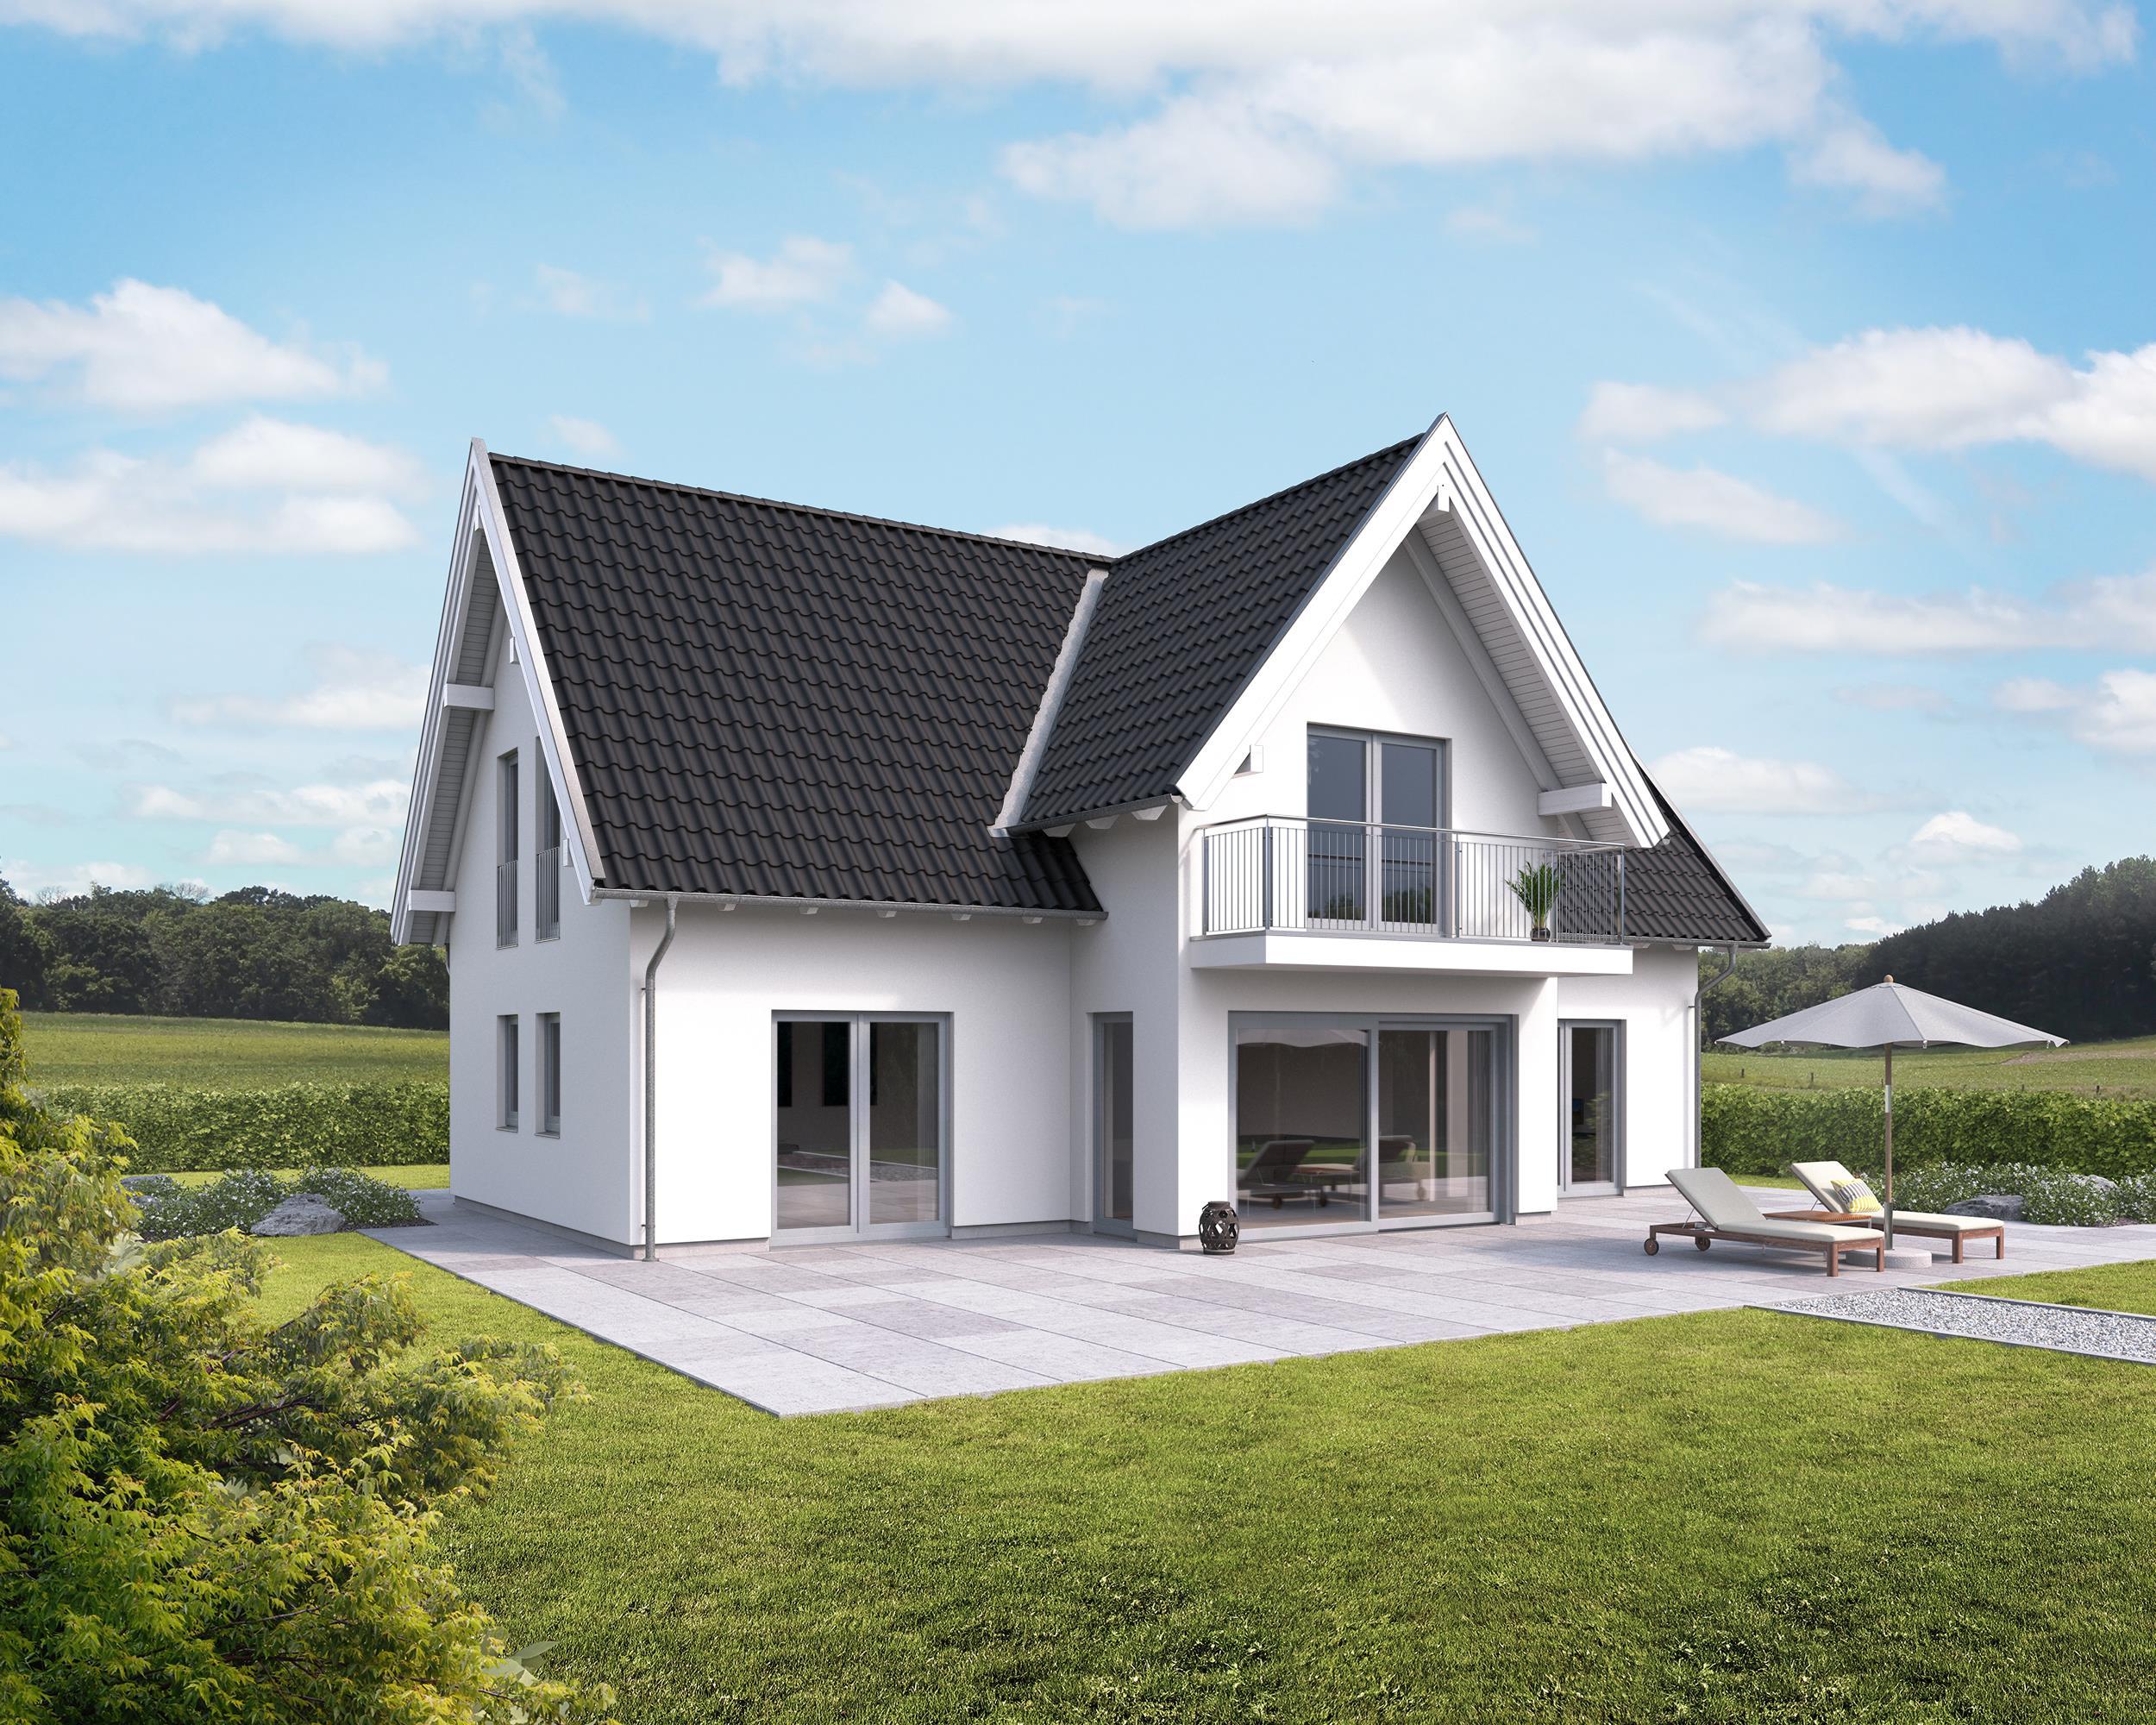 rotes dach braune fenster welche fassadenfarbe ostseesuche com. Black Bedroom Furniture Sets. Home Design Ideas